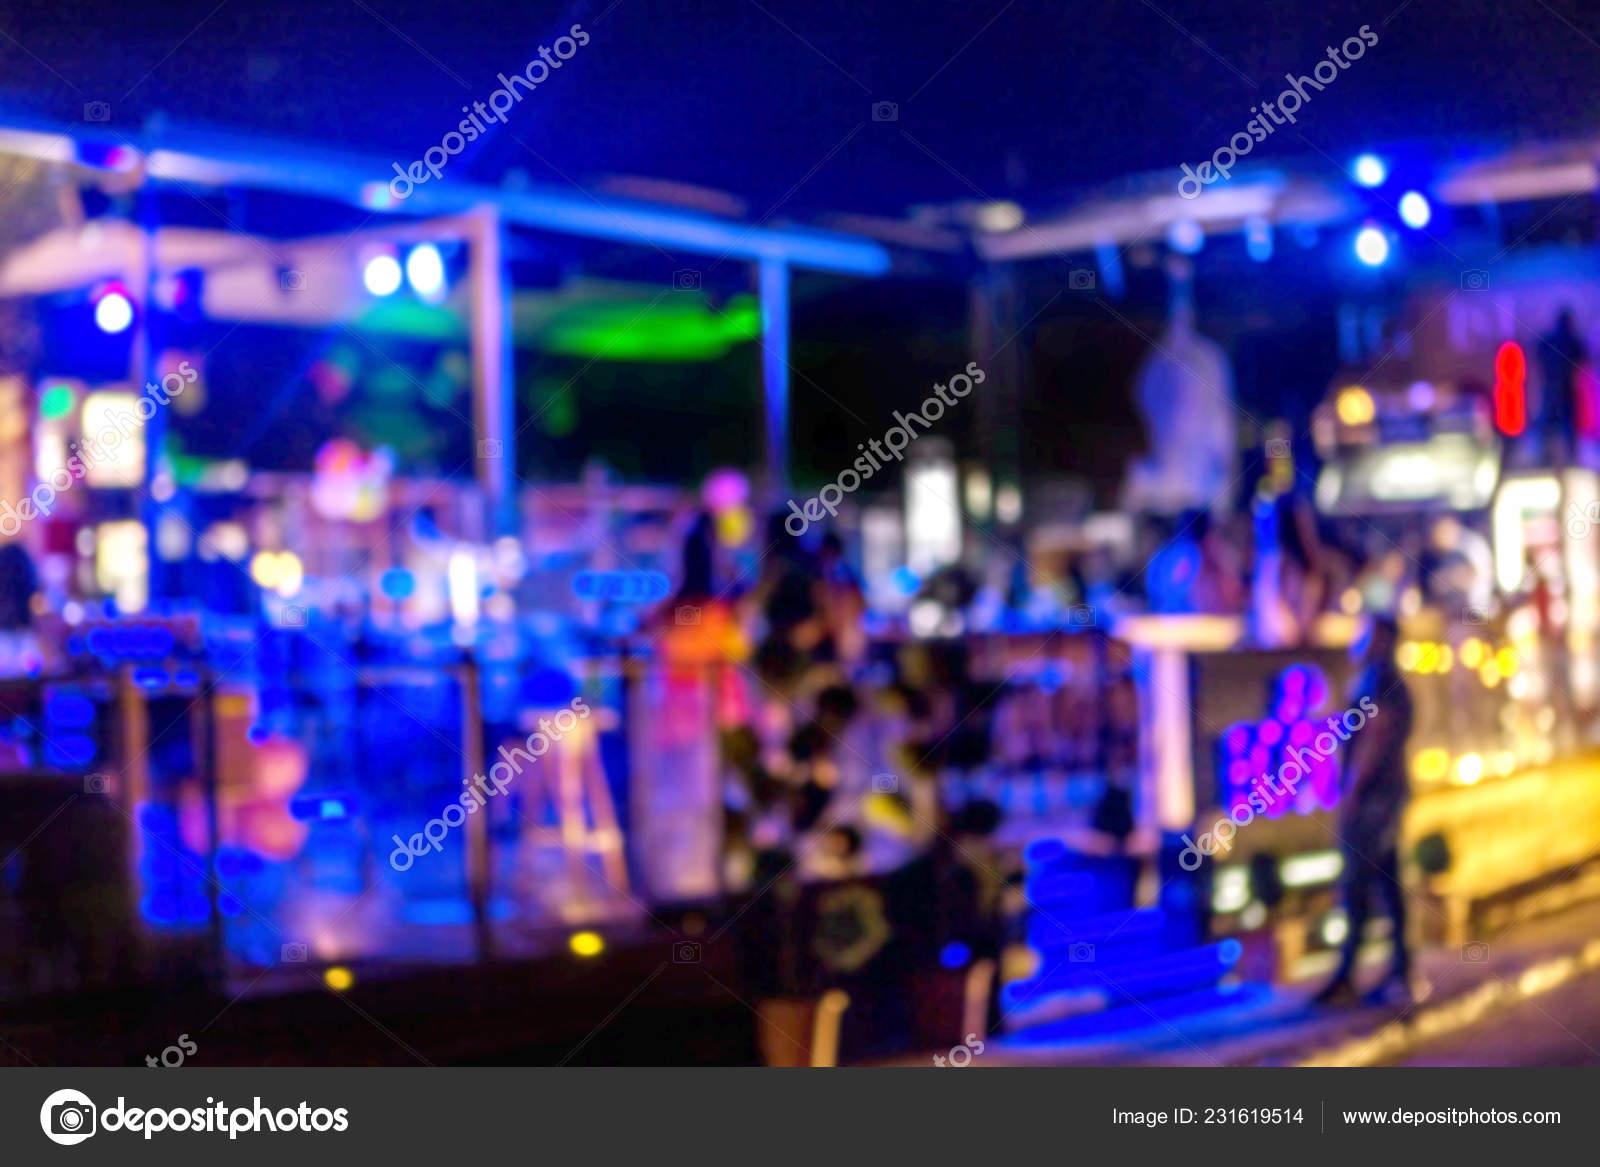 Interior Small Restaurant Blurred Background Blurred Bokeh Cafe Interior Warm Stock Photo C Alesik 231619514